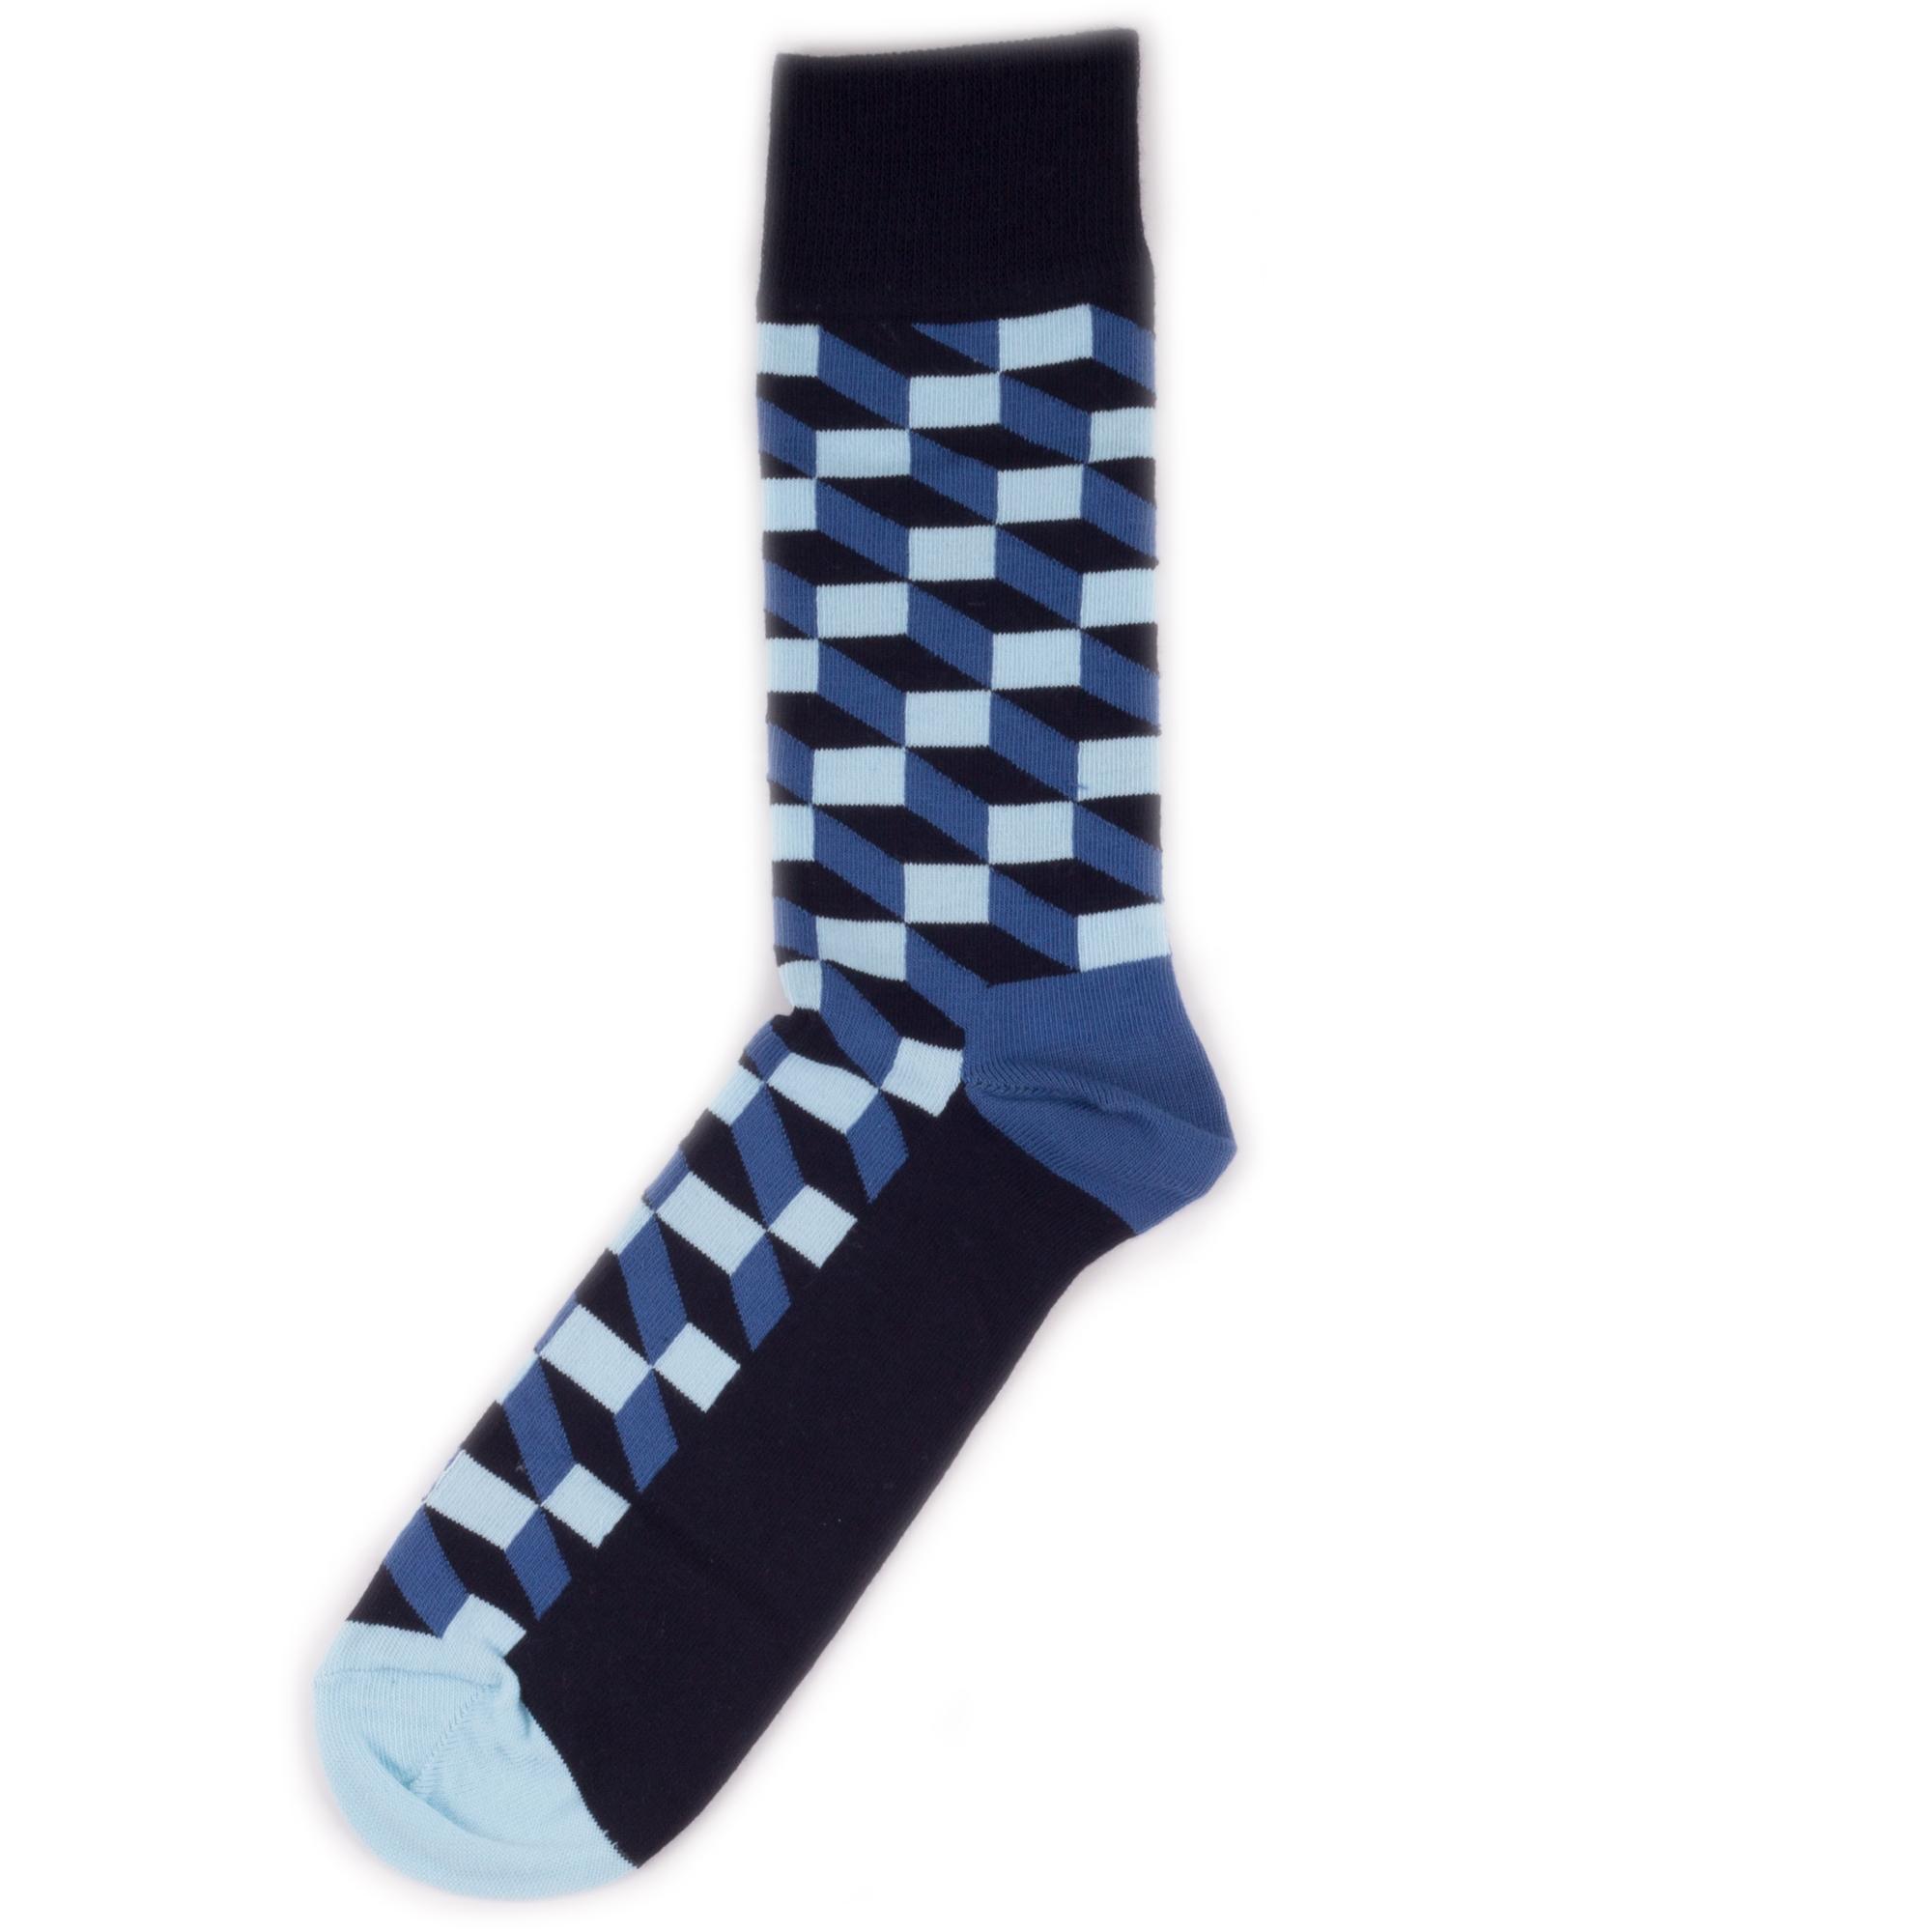 Носки унисекс Happy Socks Happy Socks Filled Optic - Black/Navy/Blue разноцветные 36-40